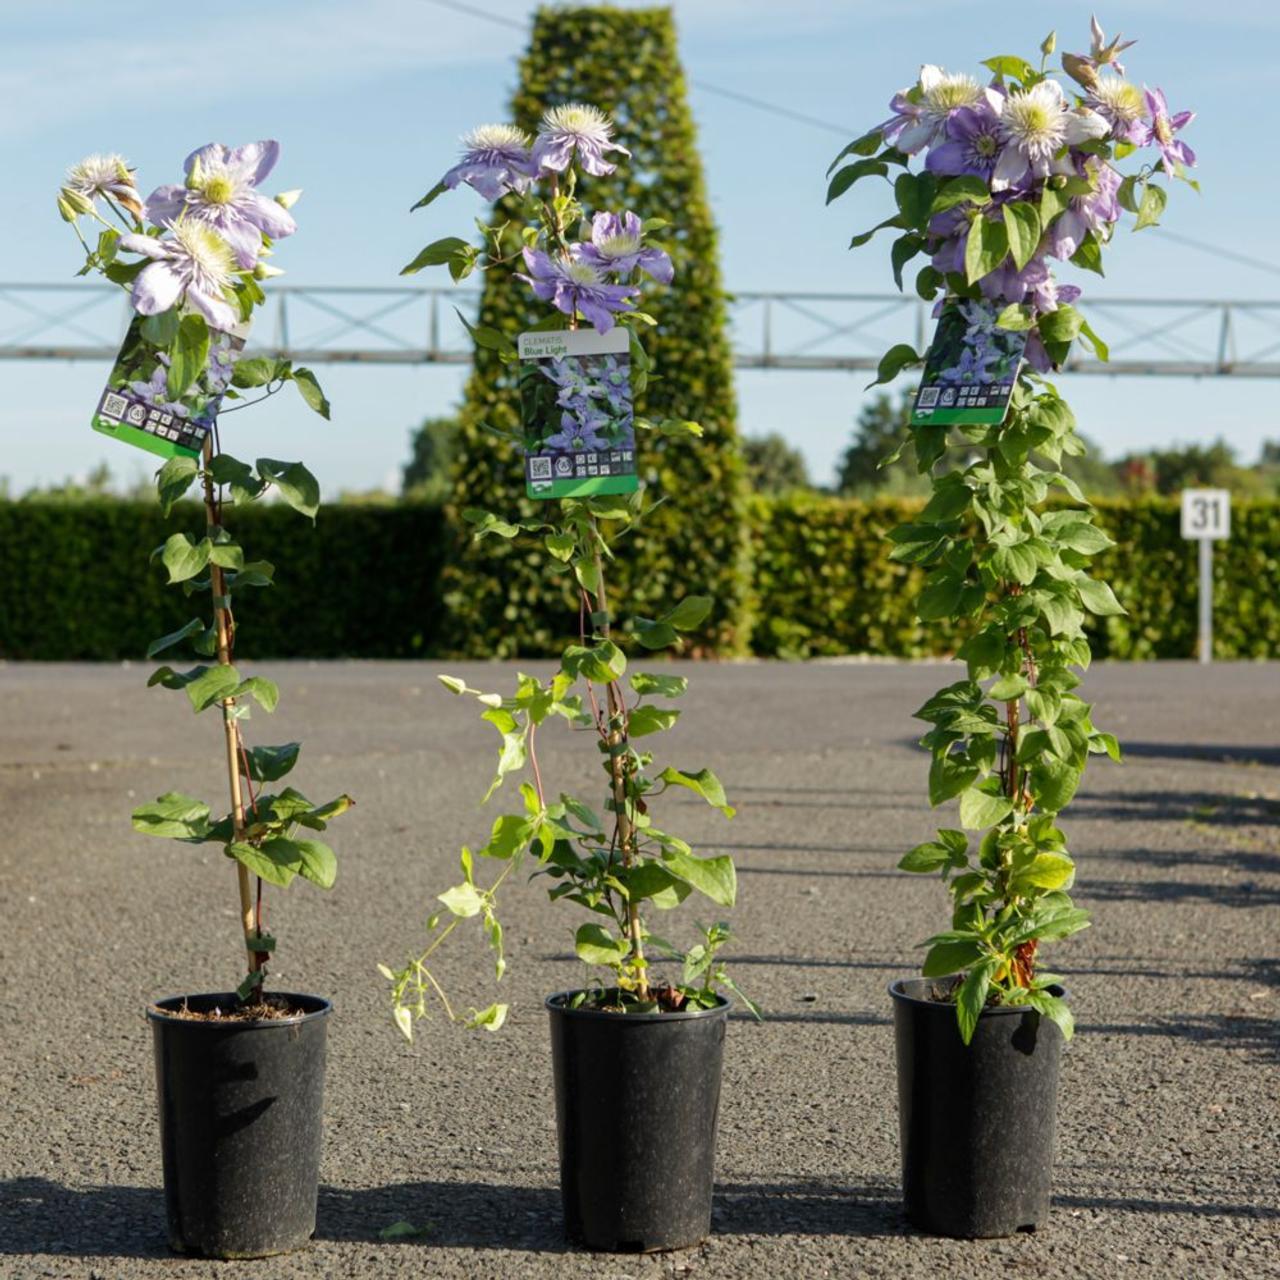 Clematis 'Blue Light' plant